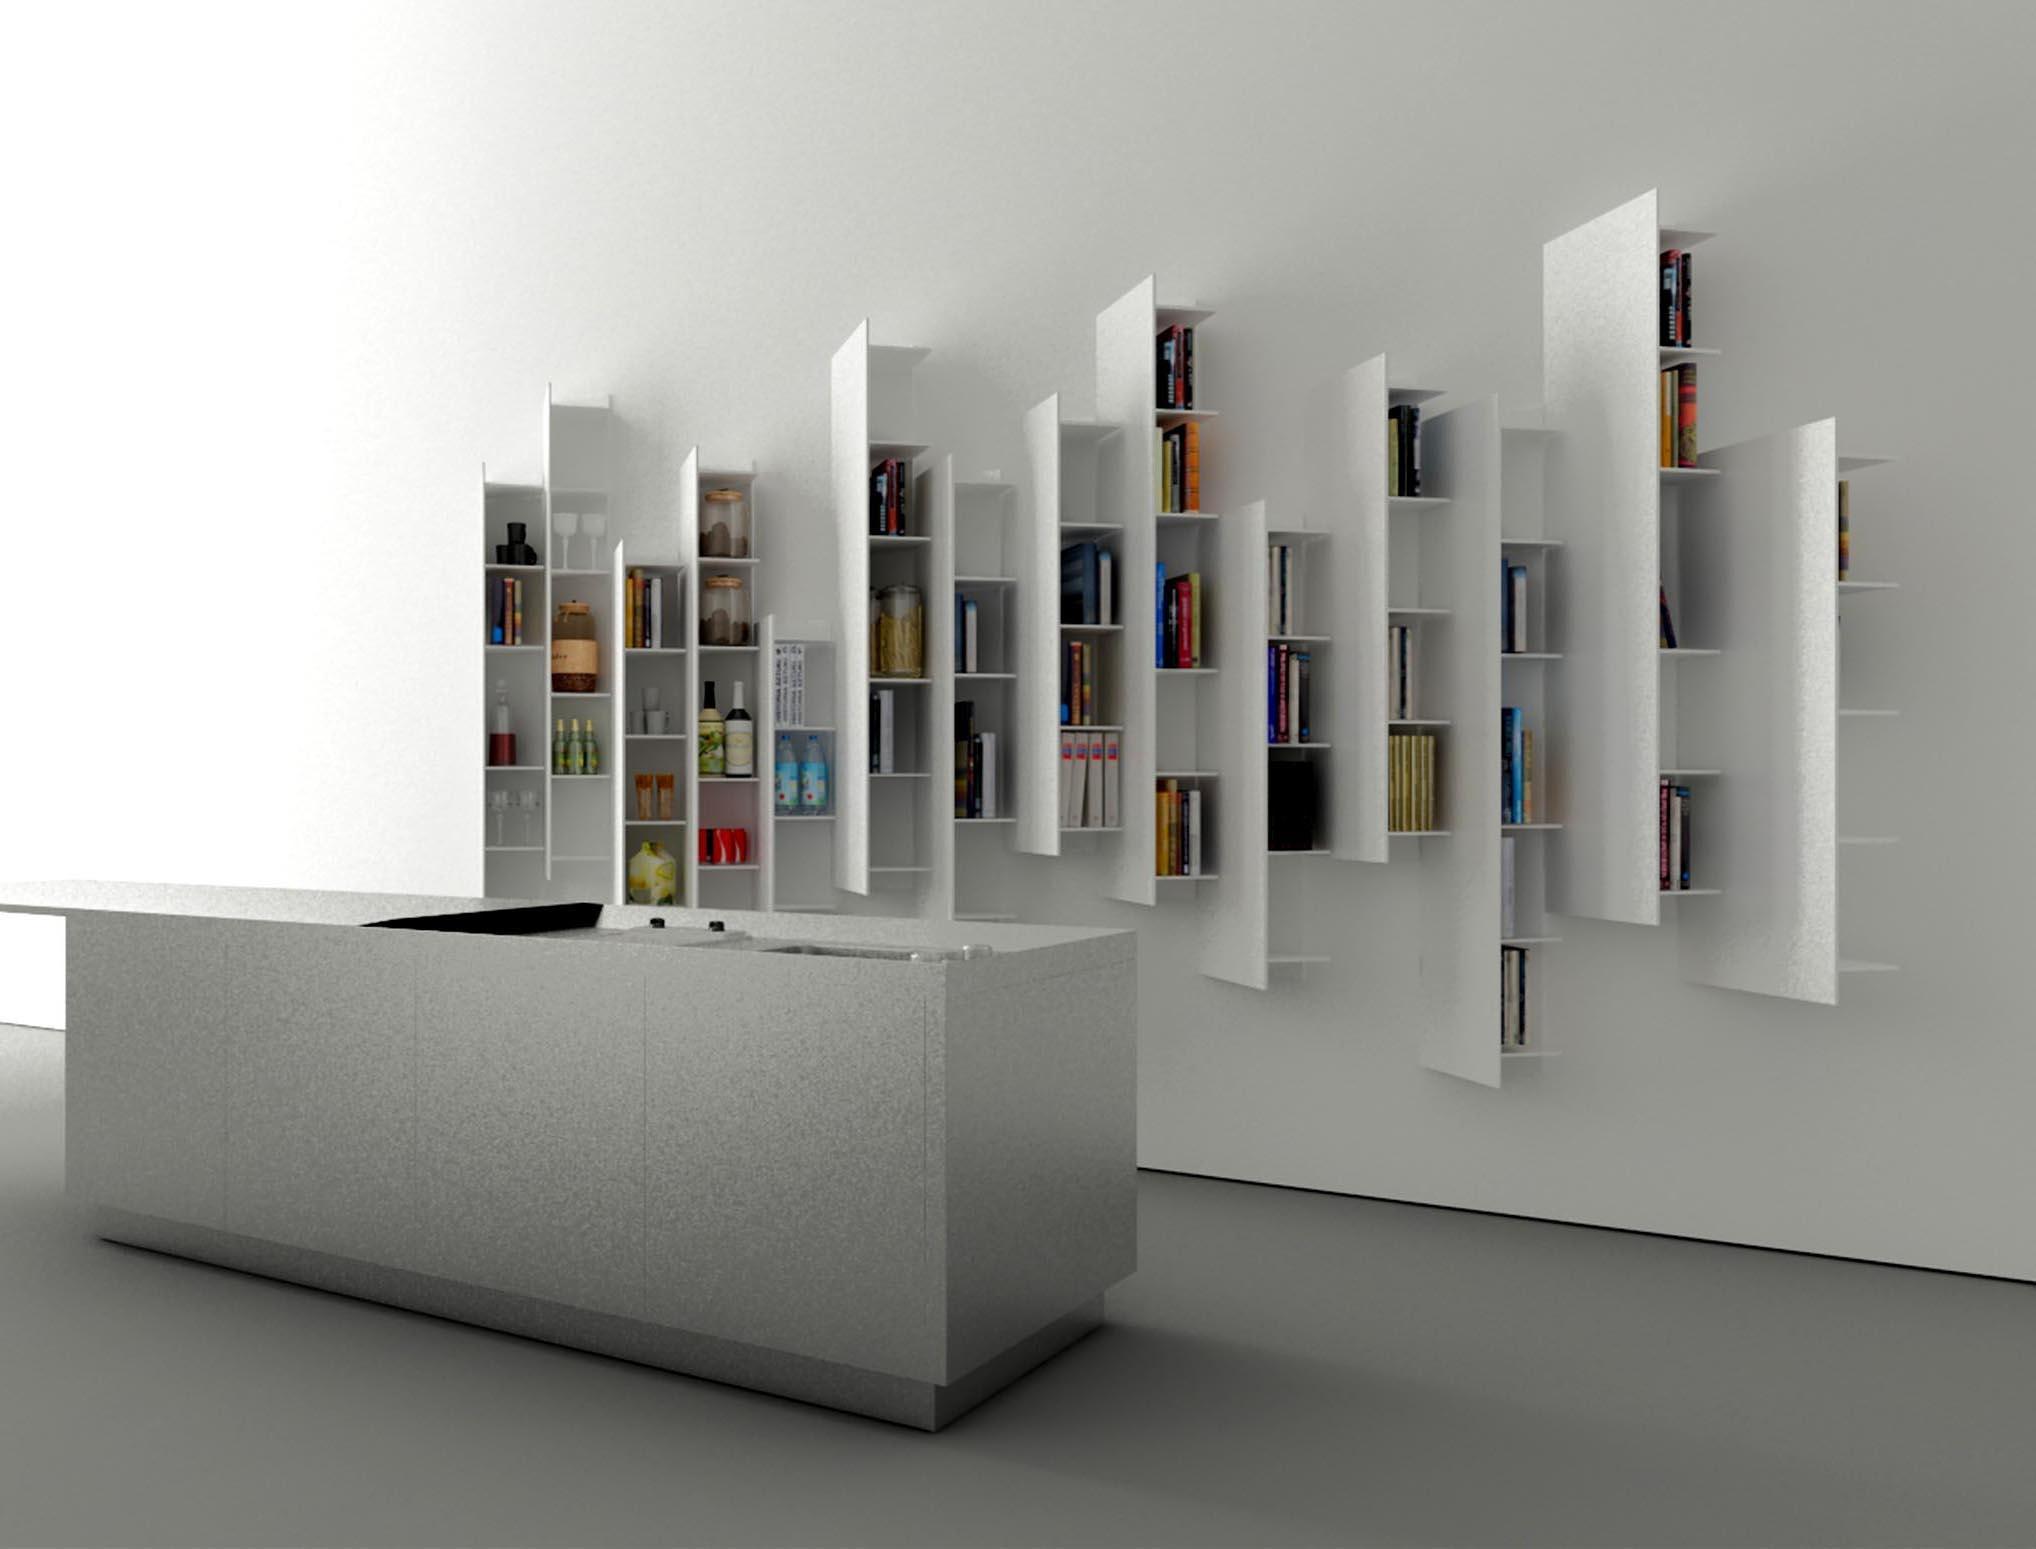 ctline bath shelving from boffi architonic. Black Bedroom Furniture Sets. Home Design Ideas